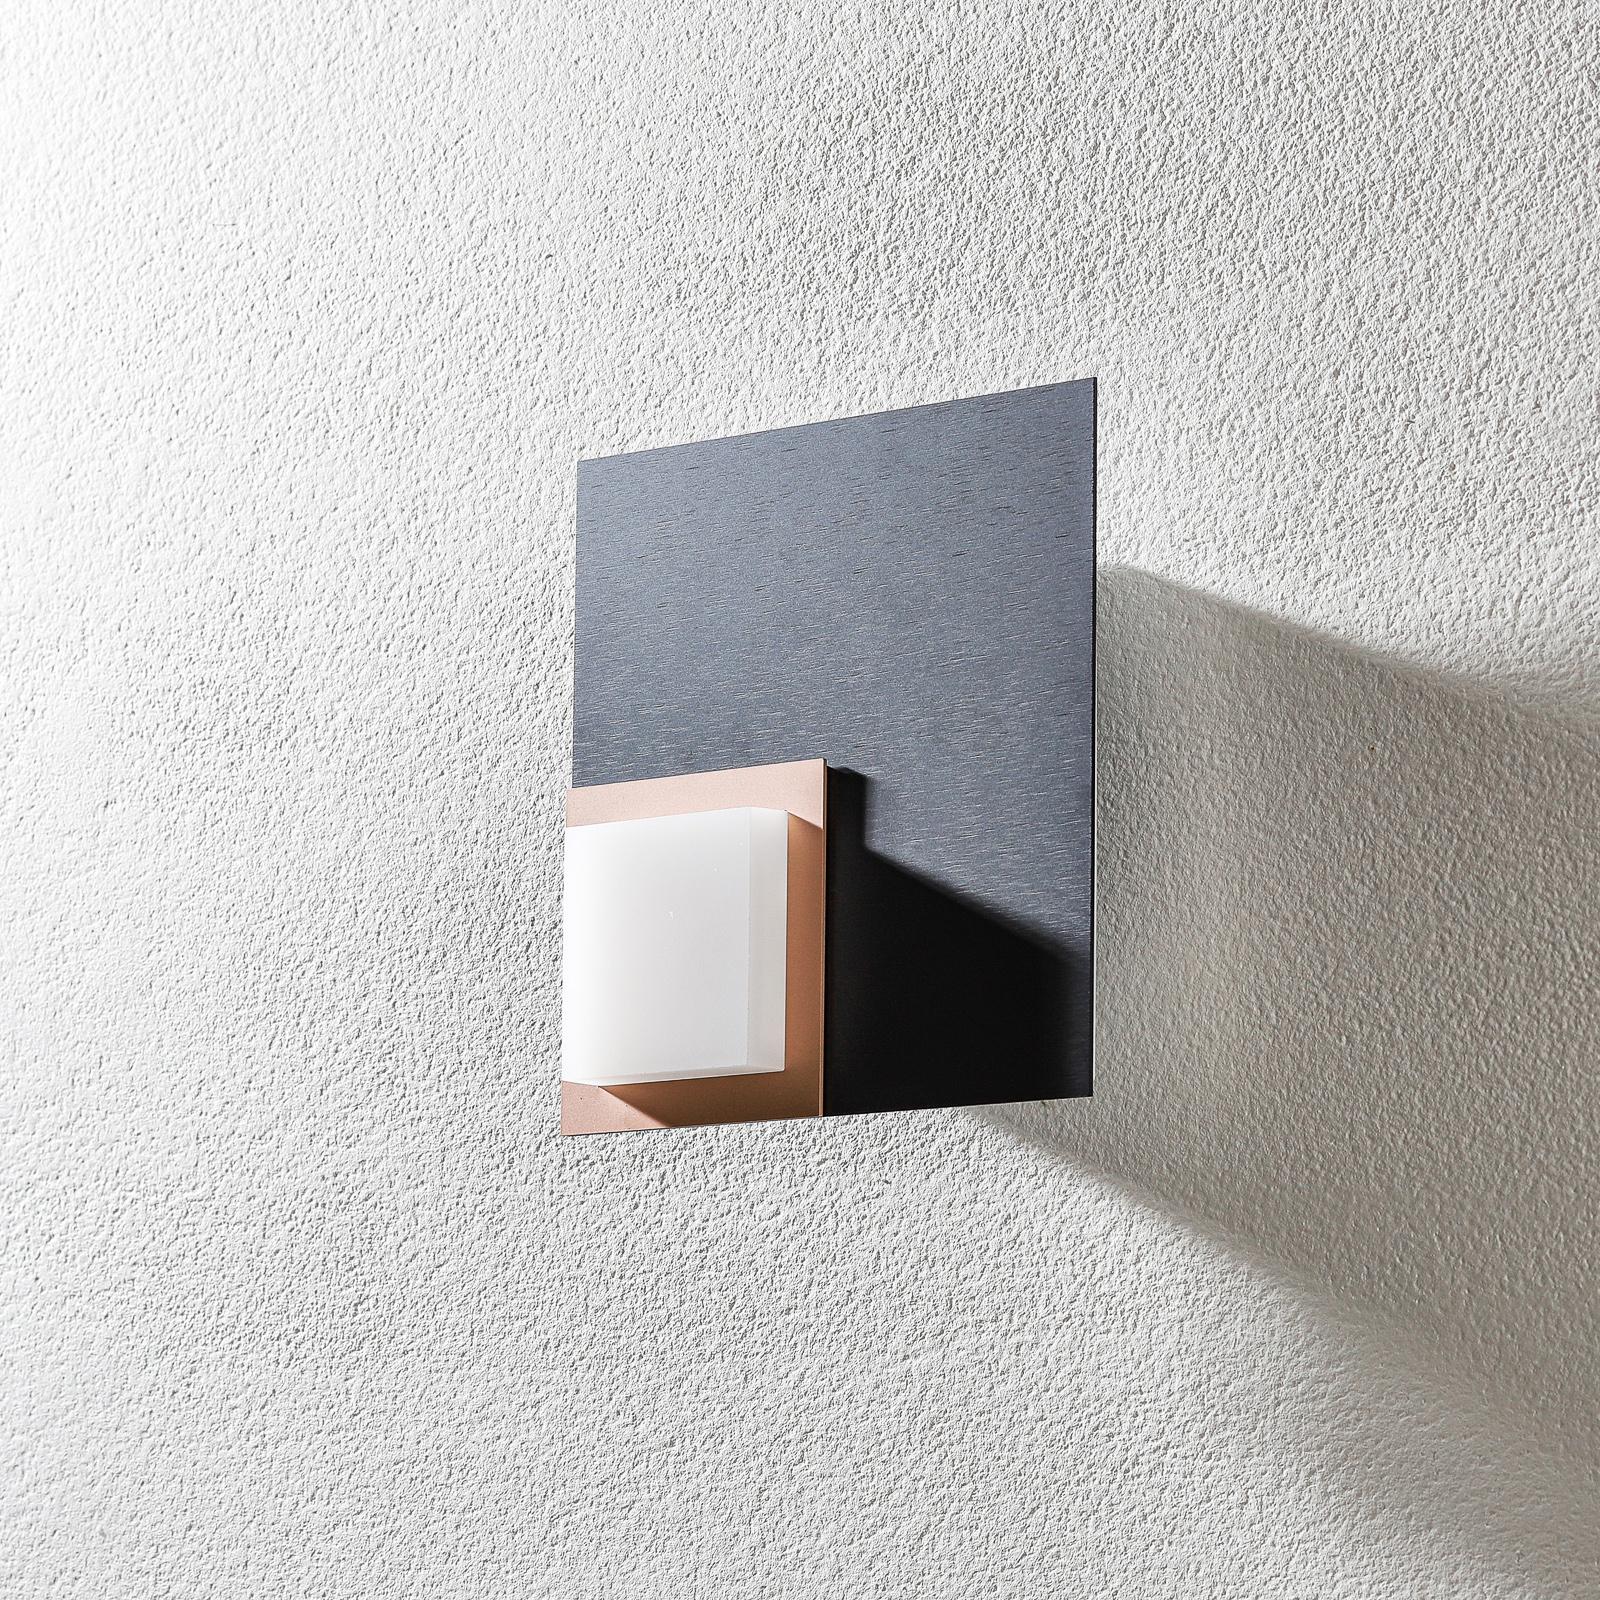 BANKAMP Quadro LED-Deckenleuchte 8W anthrazit